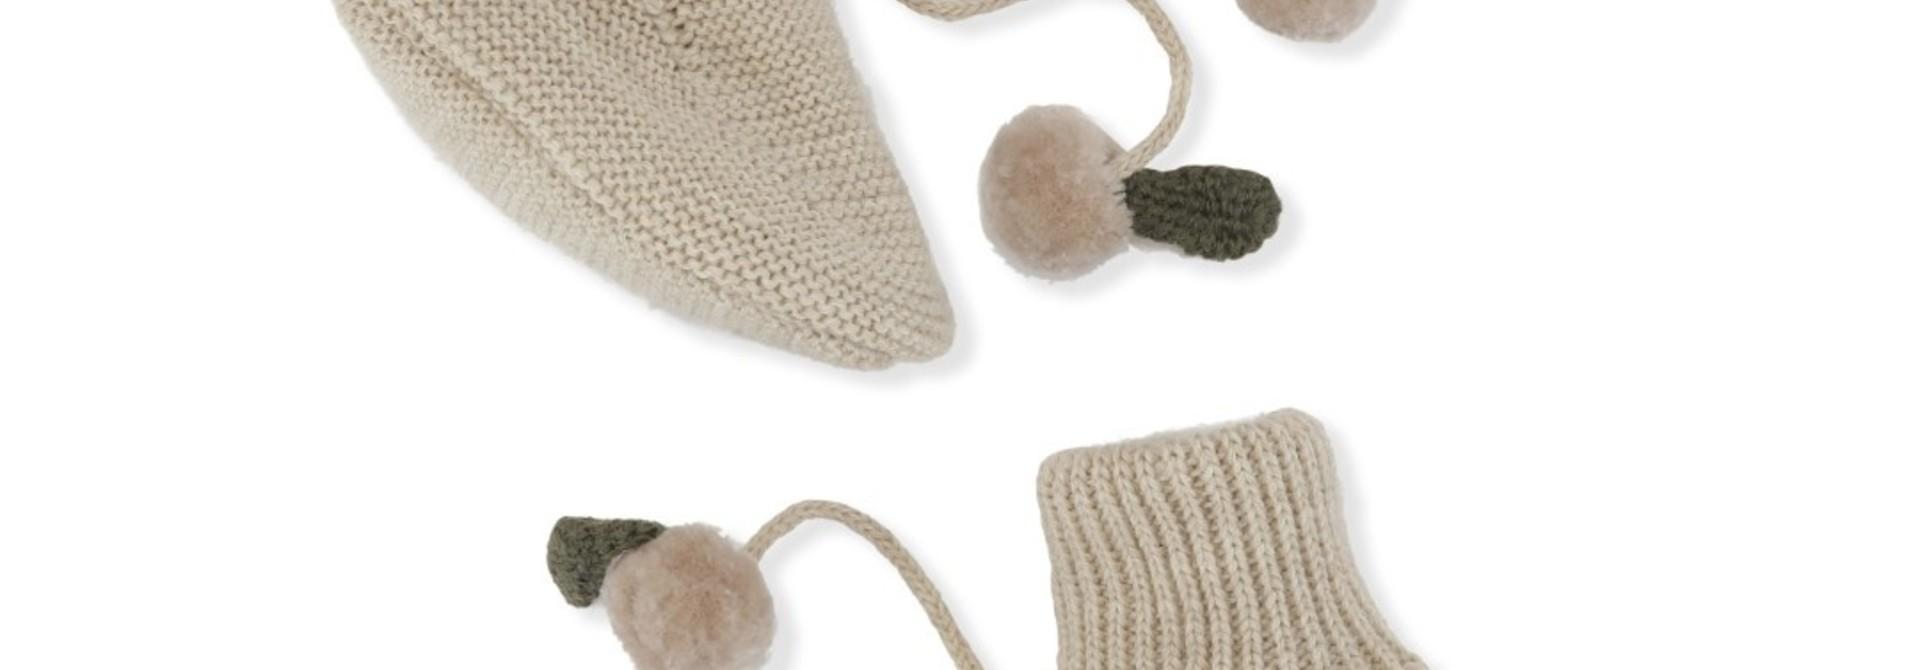 Miro knit boots - white cream melange